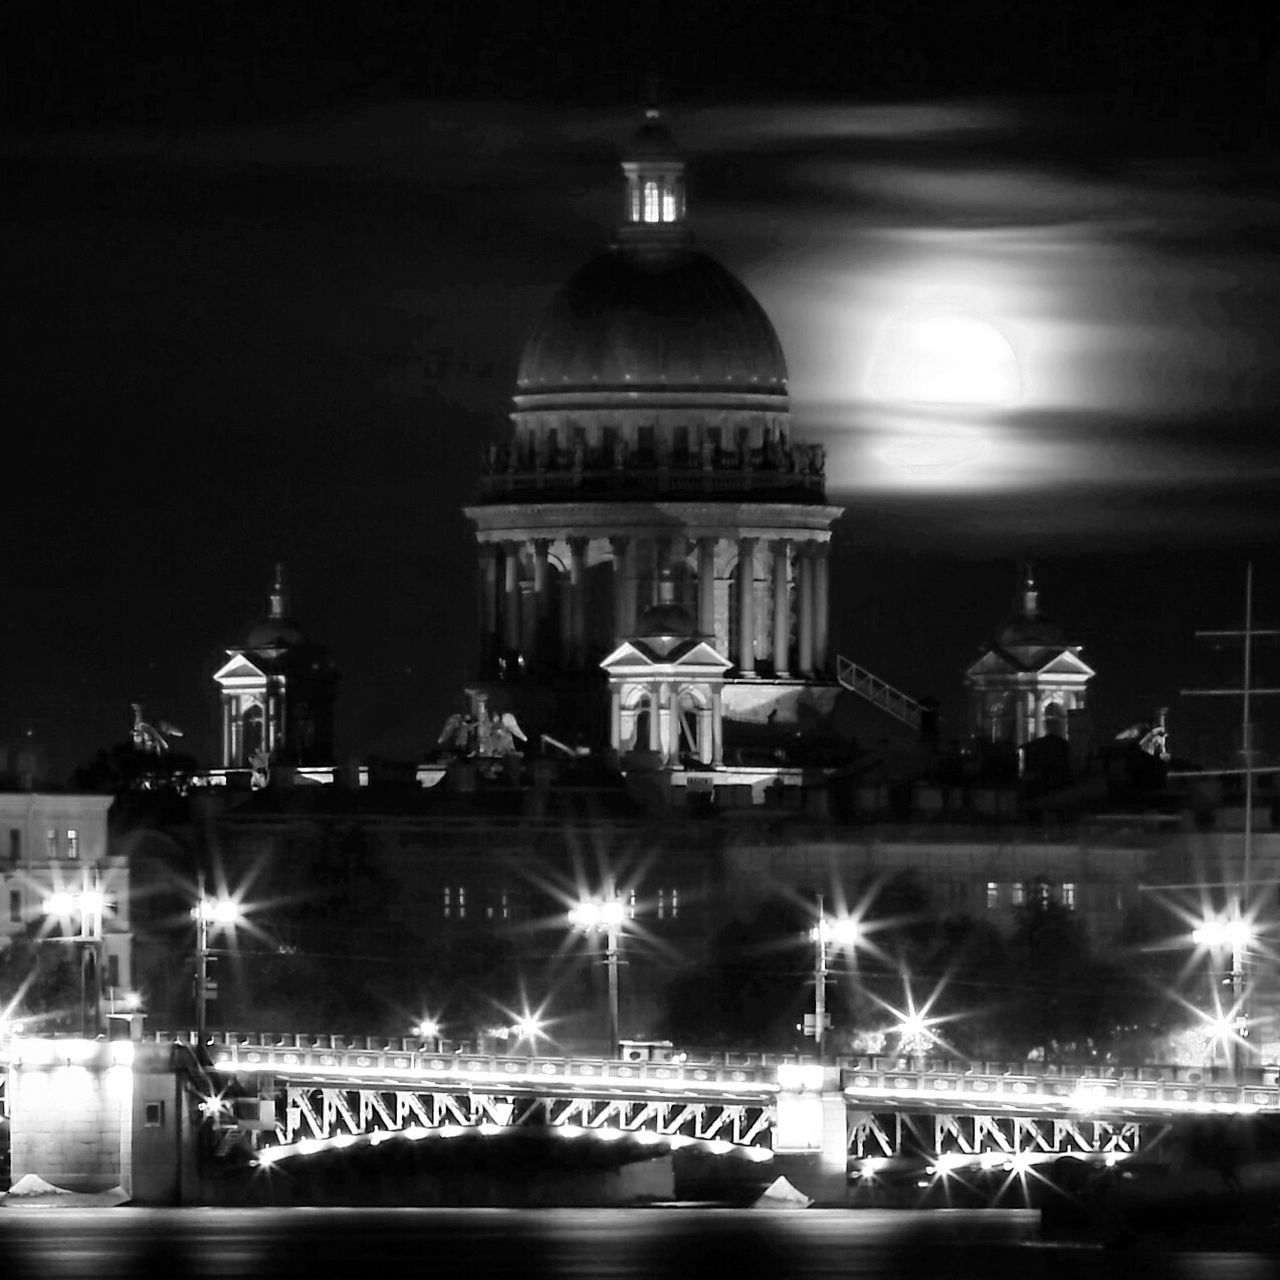 illuminated, night, religion, architecture, spirituality, building exterior, place of worship, light beam, outdoors, no people, sky